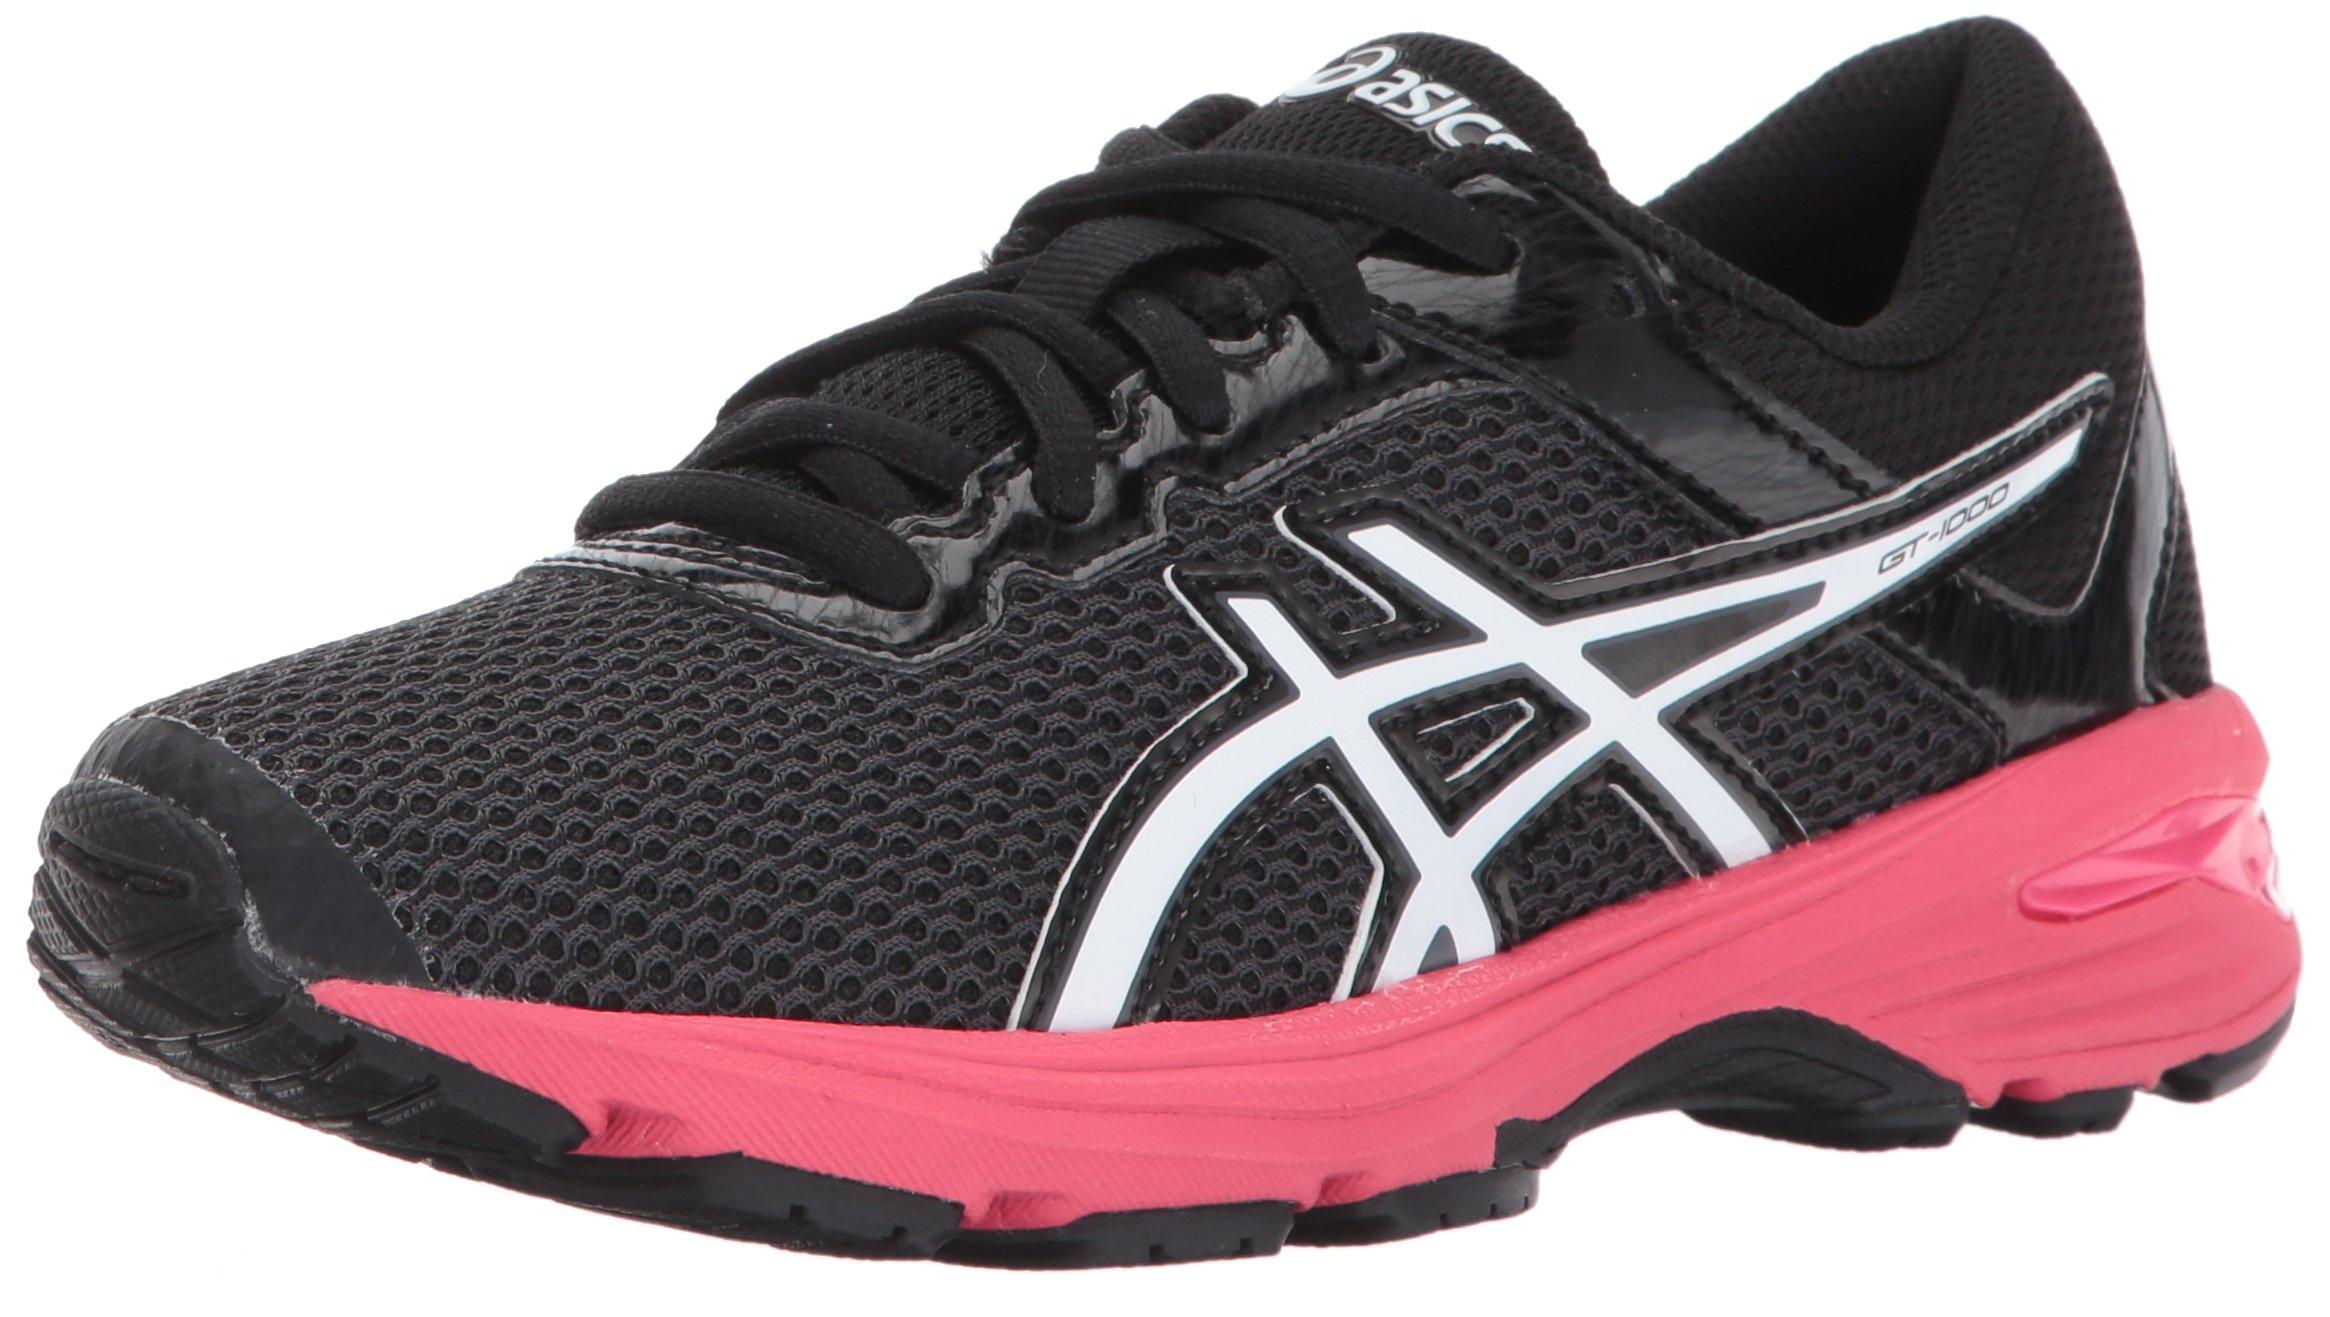 ASICS GT-1000 6 GS Kid's Running Shoe. Dark Grey/White/Rouge Red, 3.5 M US Big Kid by ASICS (Image #1)